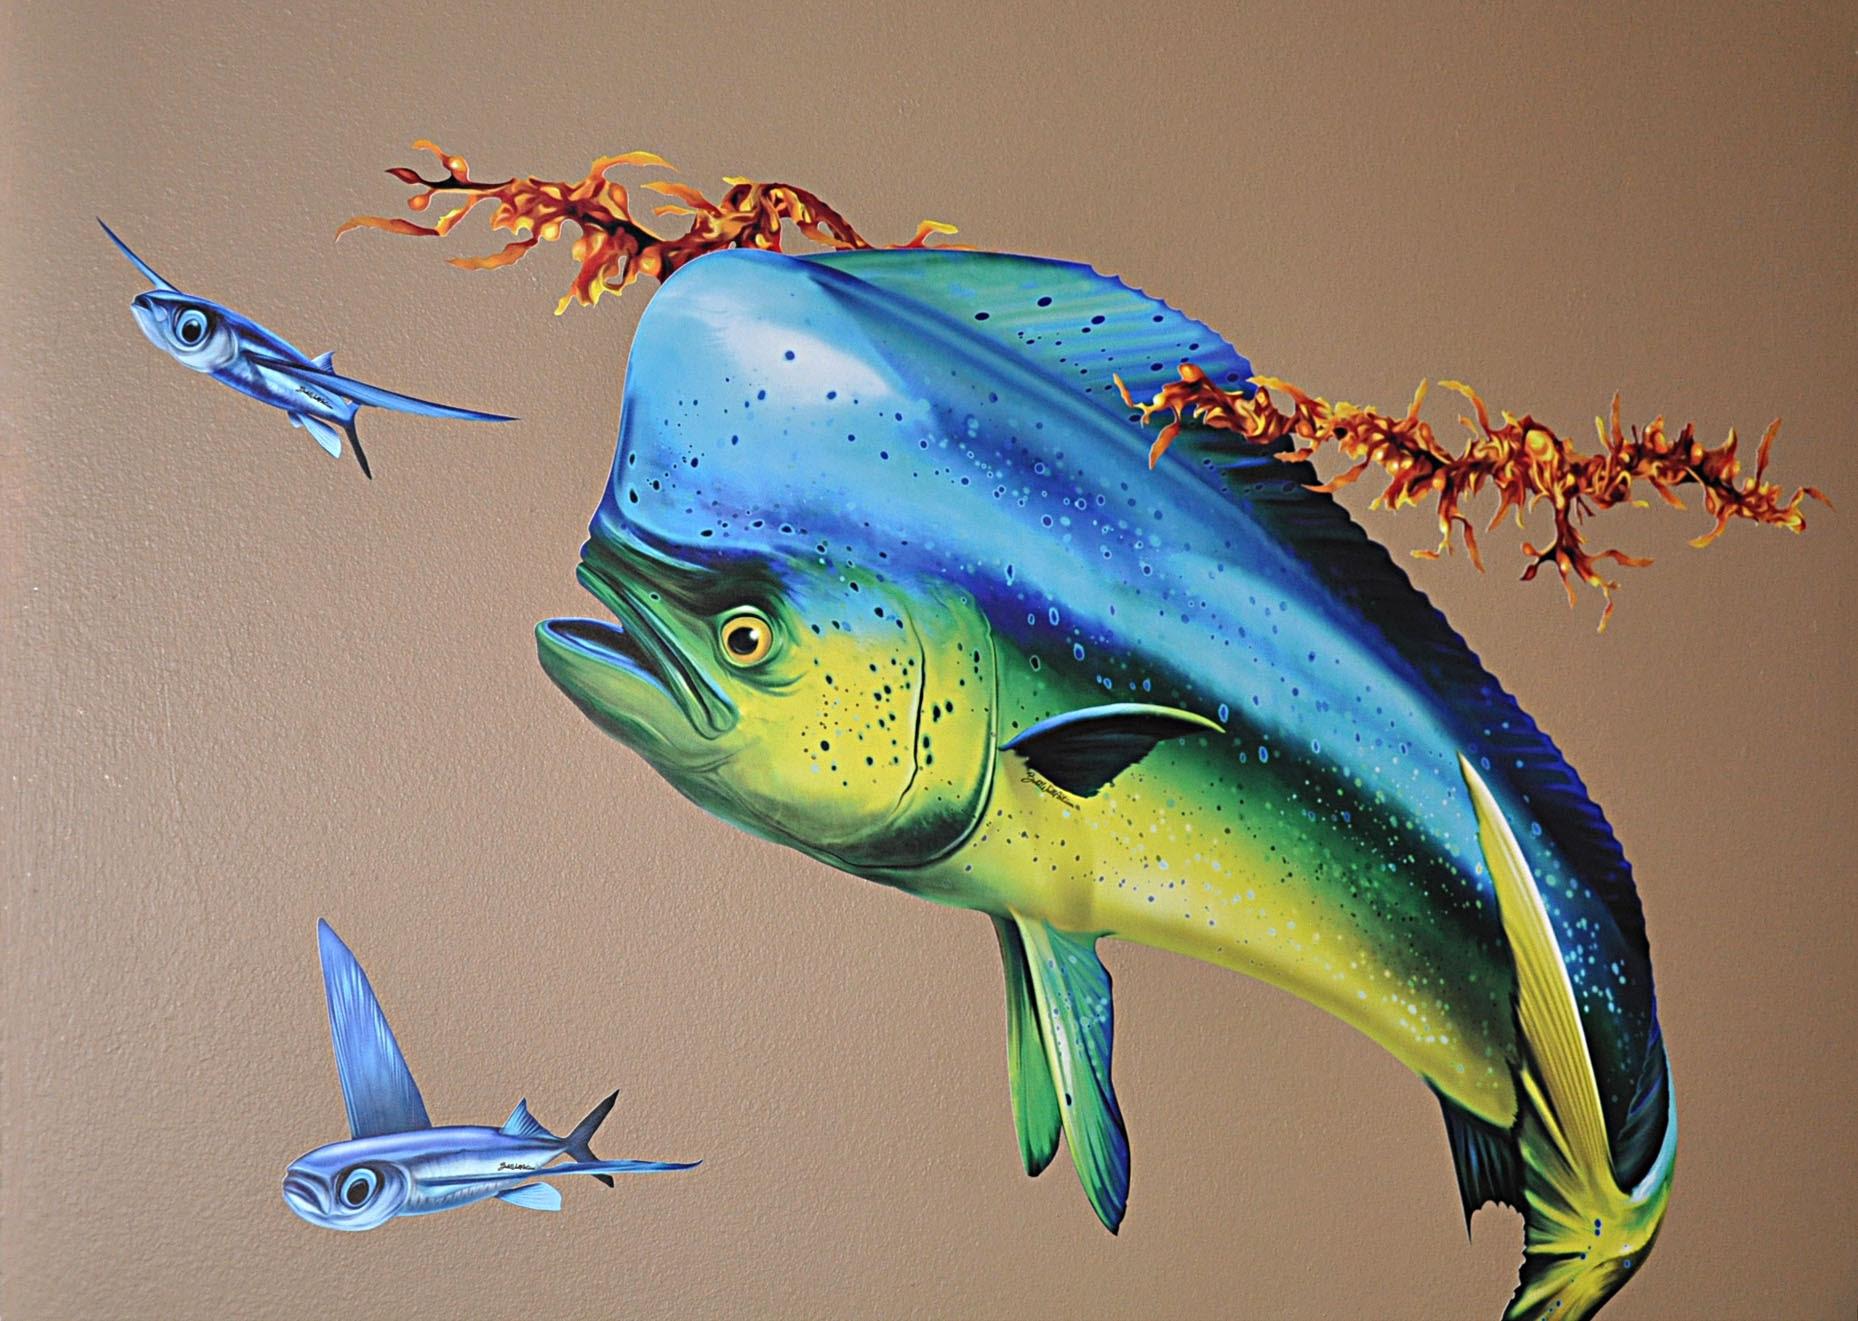 Mahi mahi wallpaper as desktop backgrounds - Mahi Cw 3 Dolphin Fish Pictures